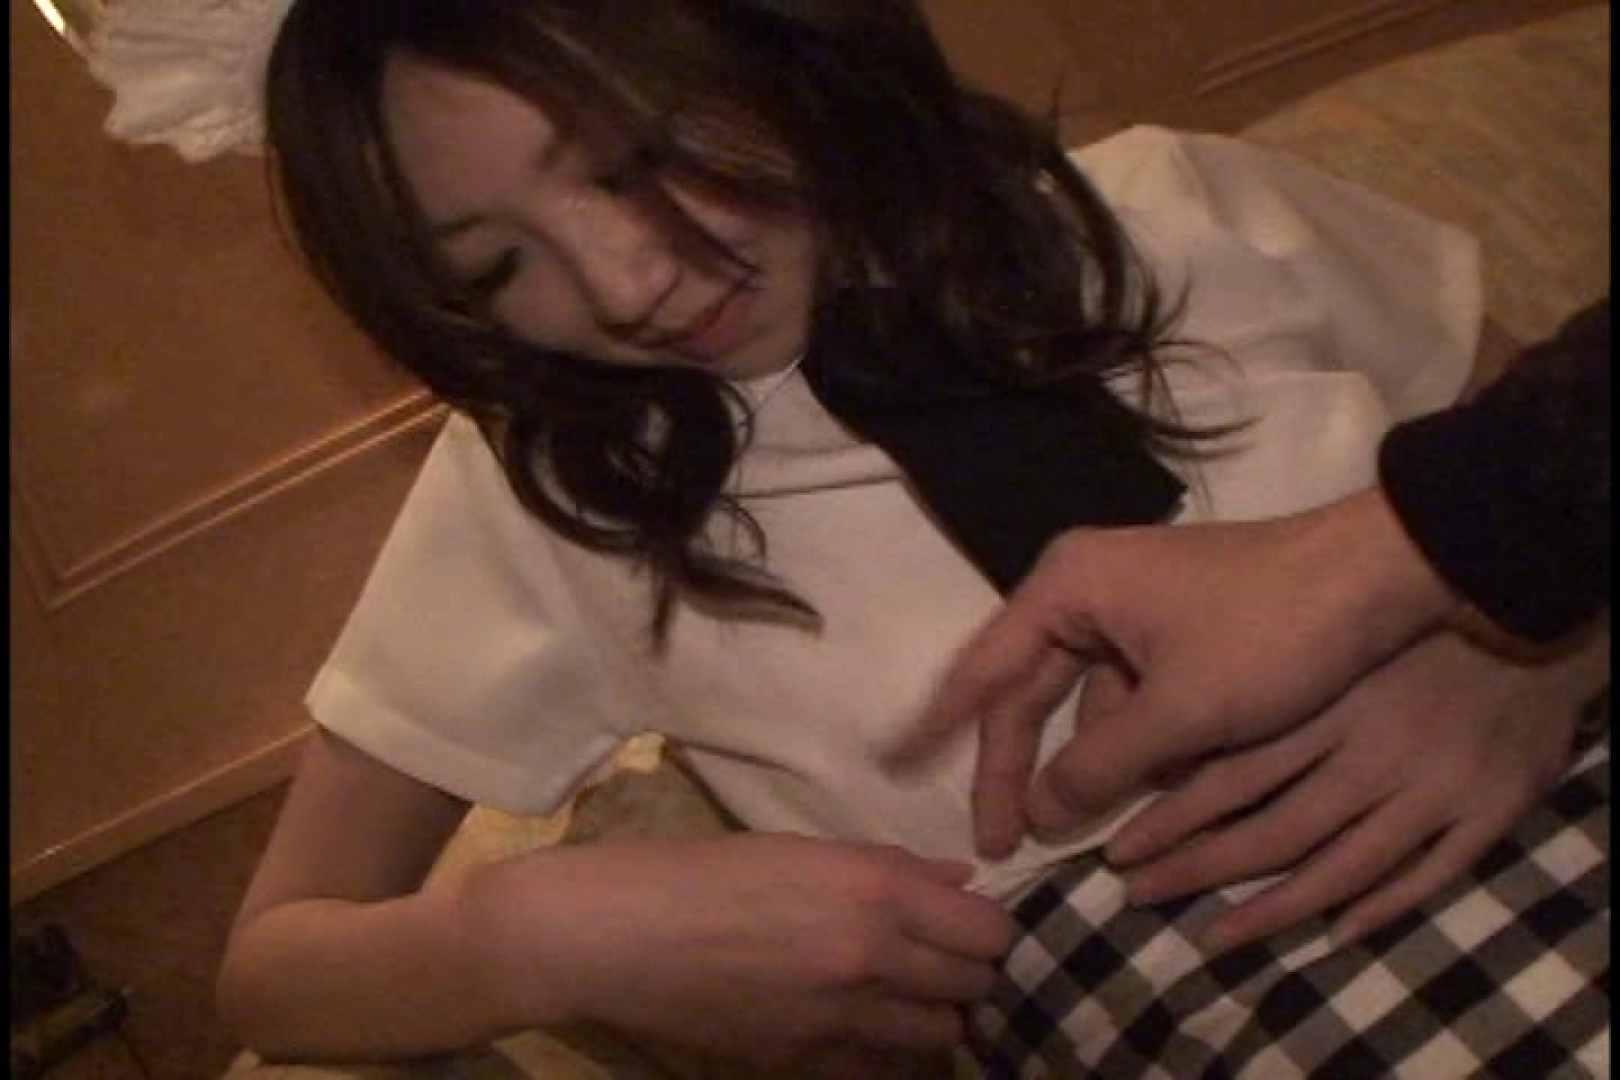 JDハンター全国ツアー vol.041 前編 女子大生のエロ動画  85PIX 46